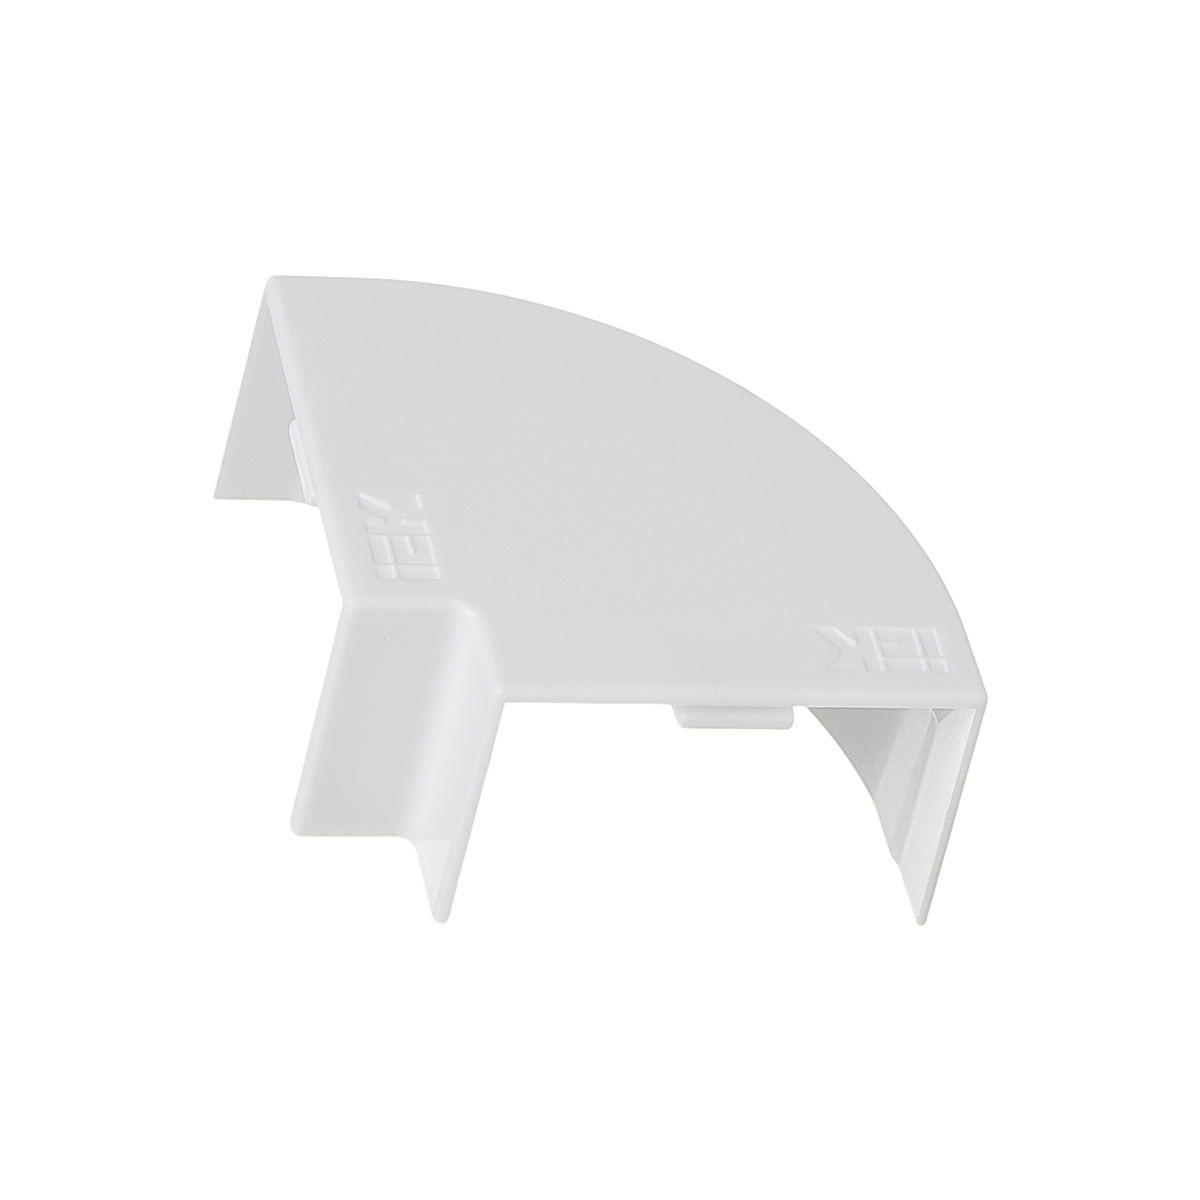 Угол плоский для кабель-канала 40x25 мм белый (4 шт.)